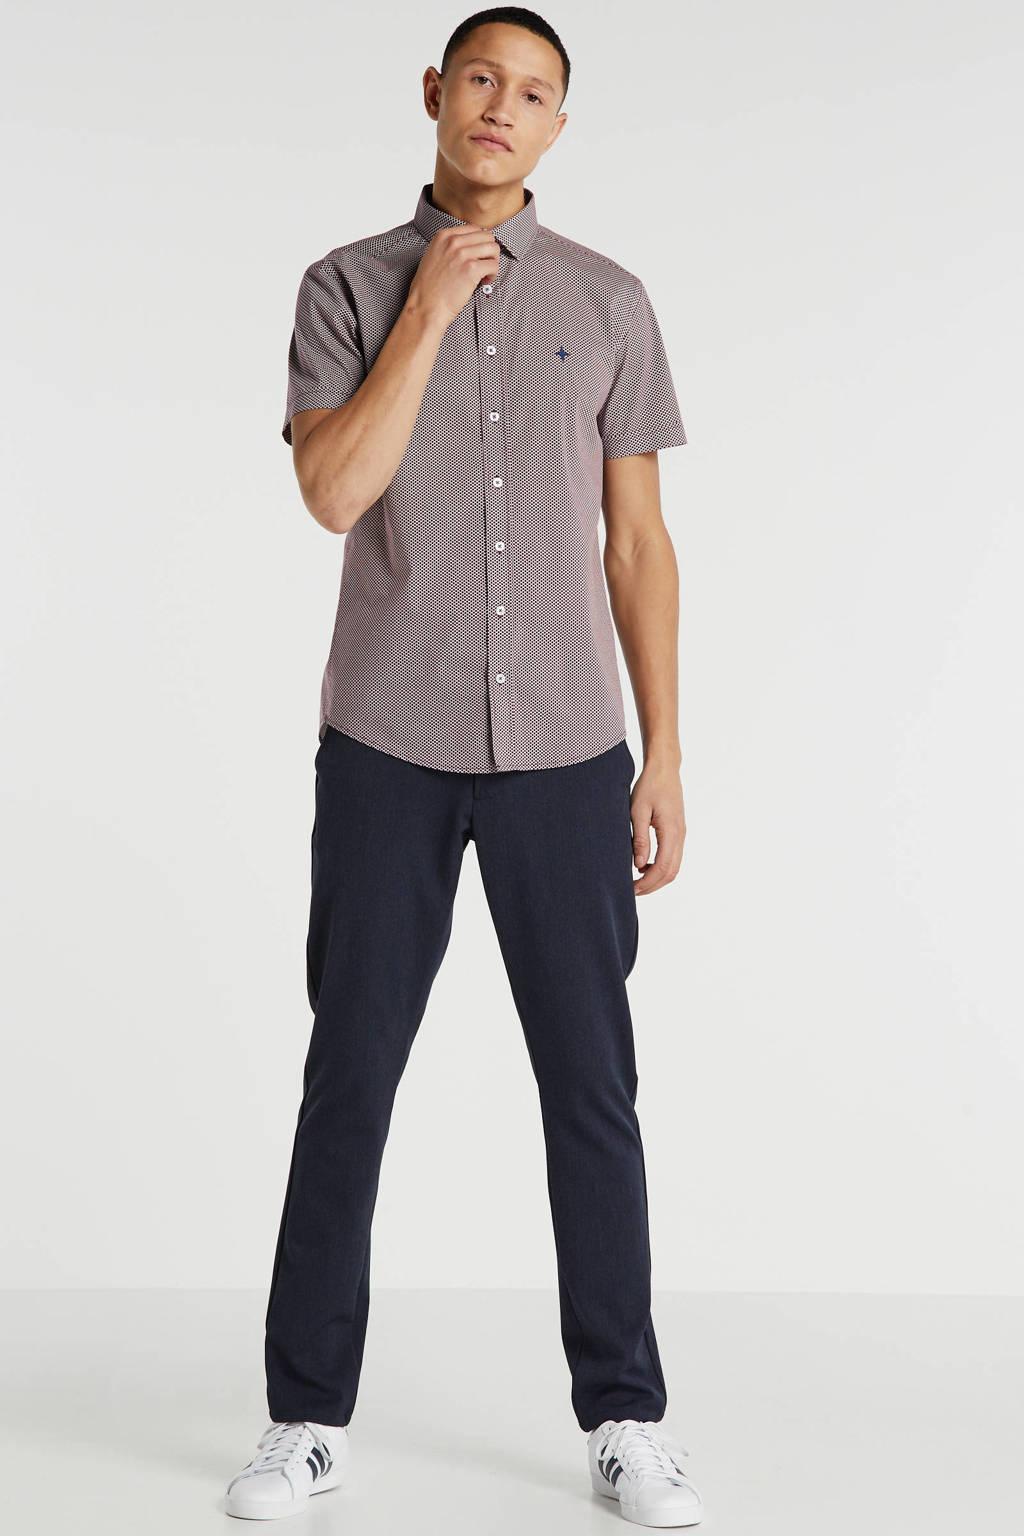 Haze & Finn slim fit overhemd met all over print donkerrood, Donkerrood